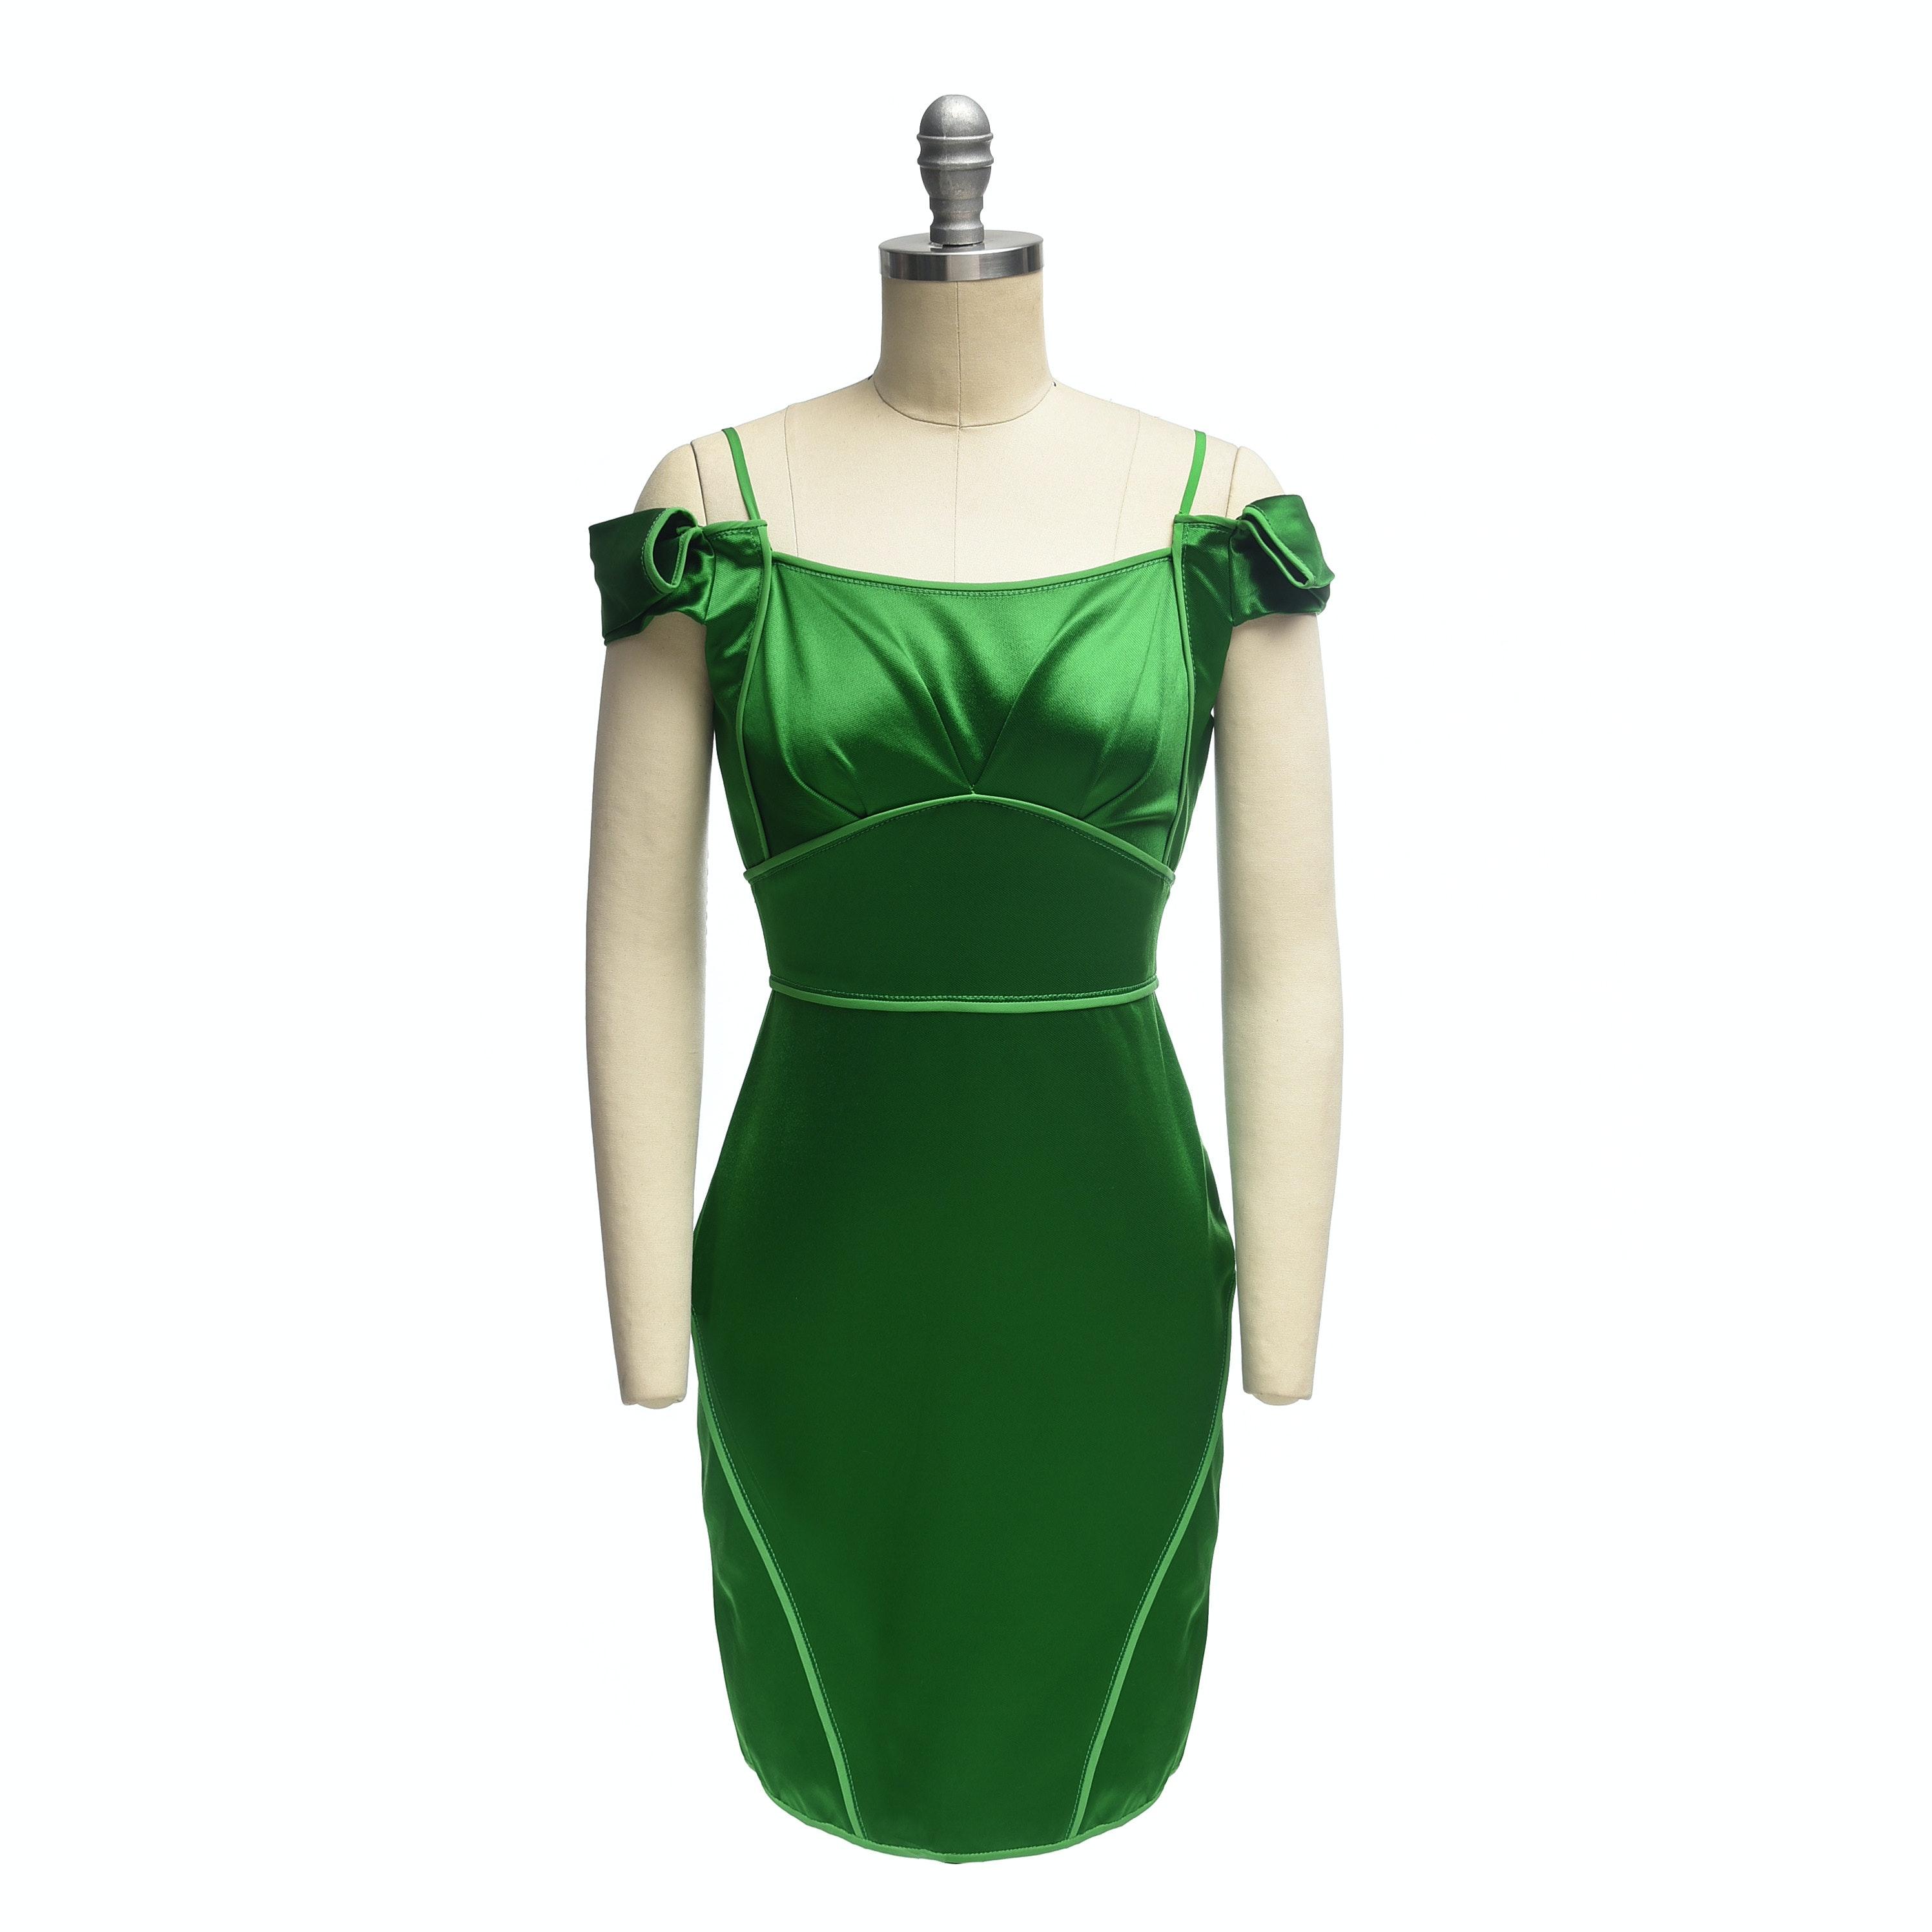 Zac Posen Emerald Green Satin Cap Sleeve Mini Dress